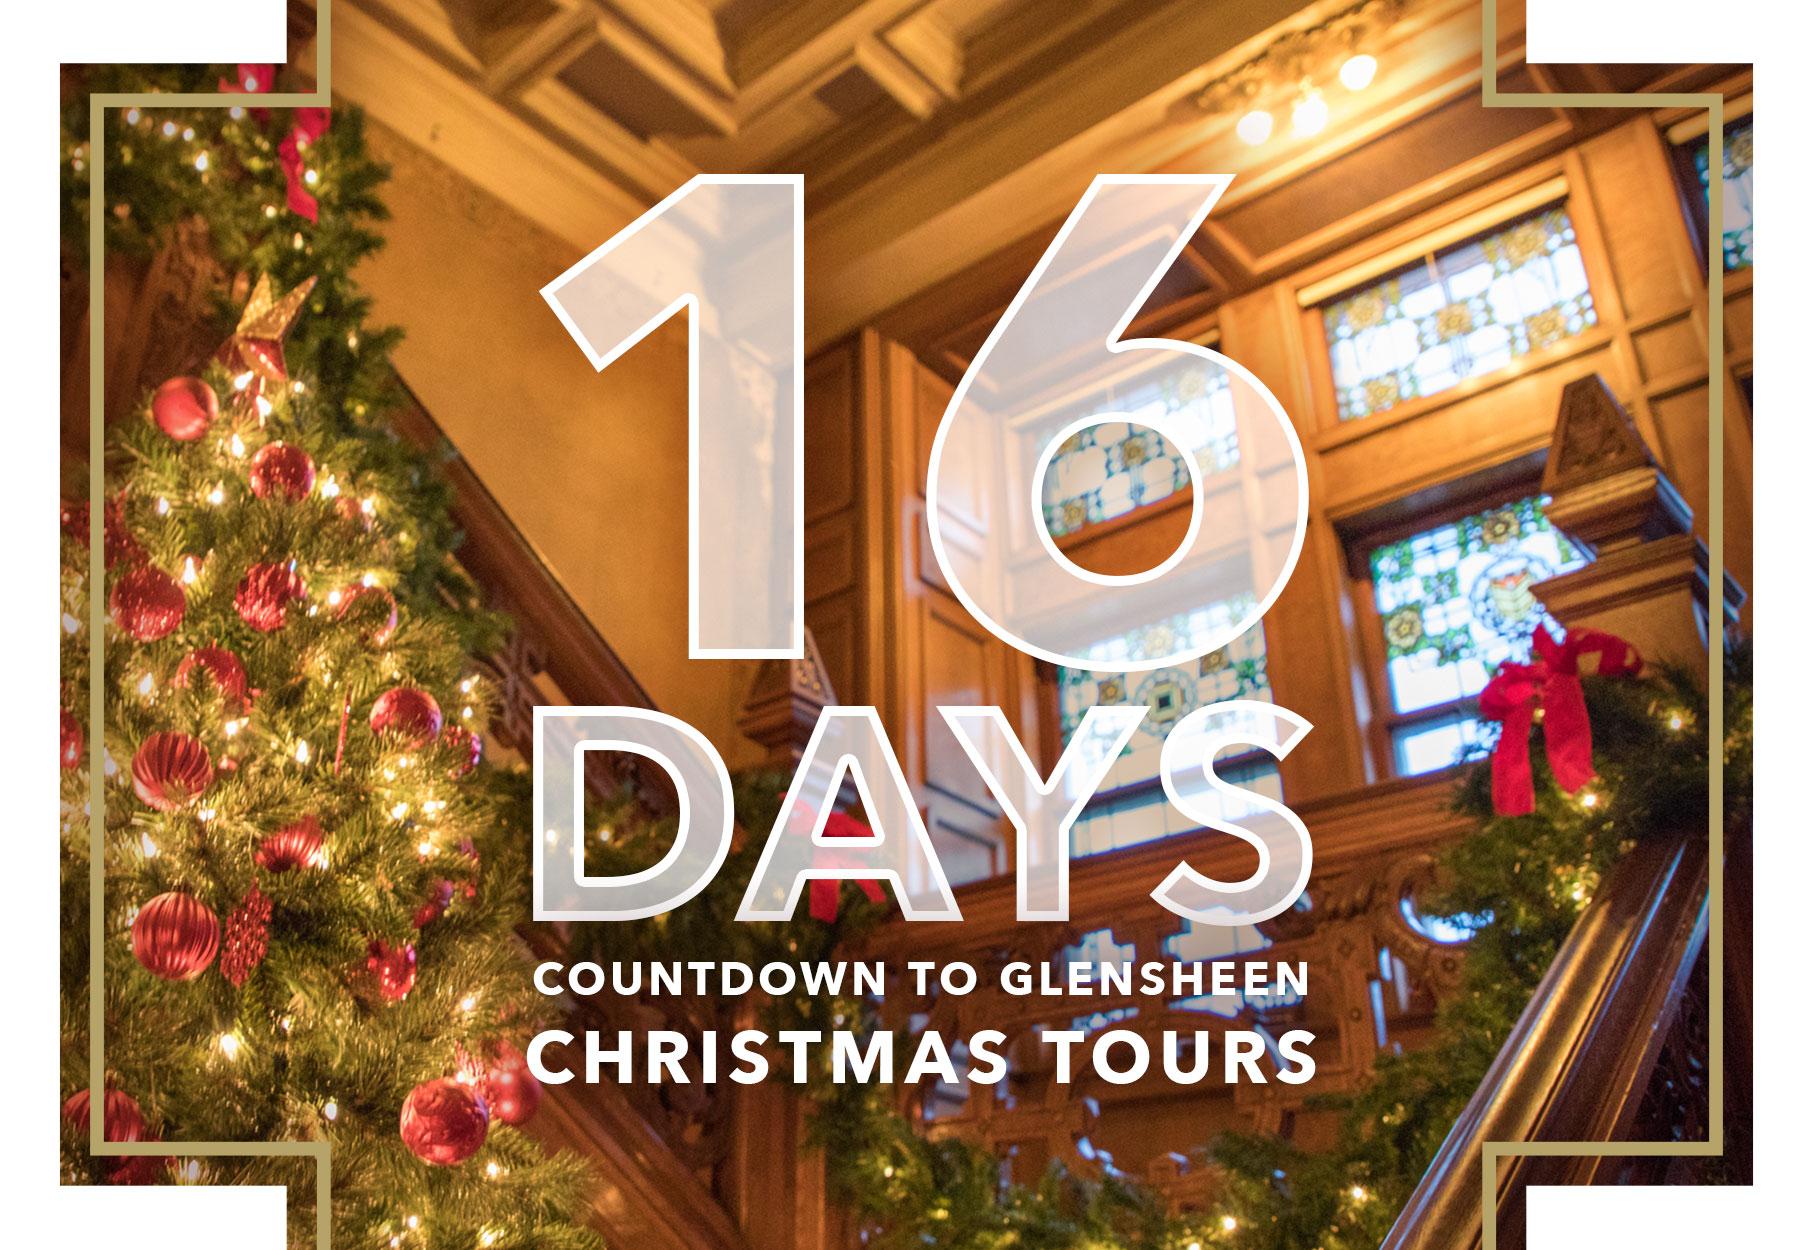 Christmas Tours.16 Days Until Christmas Tours Glensheen